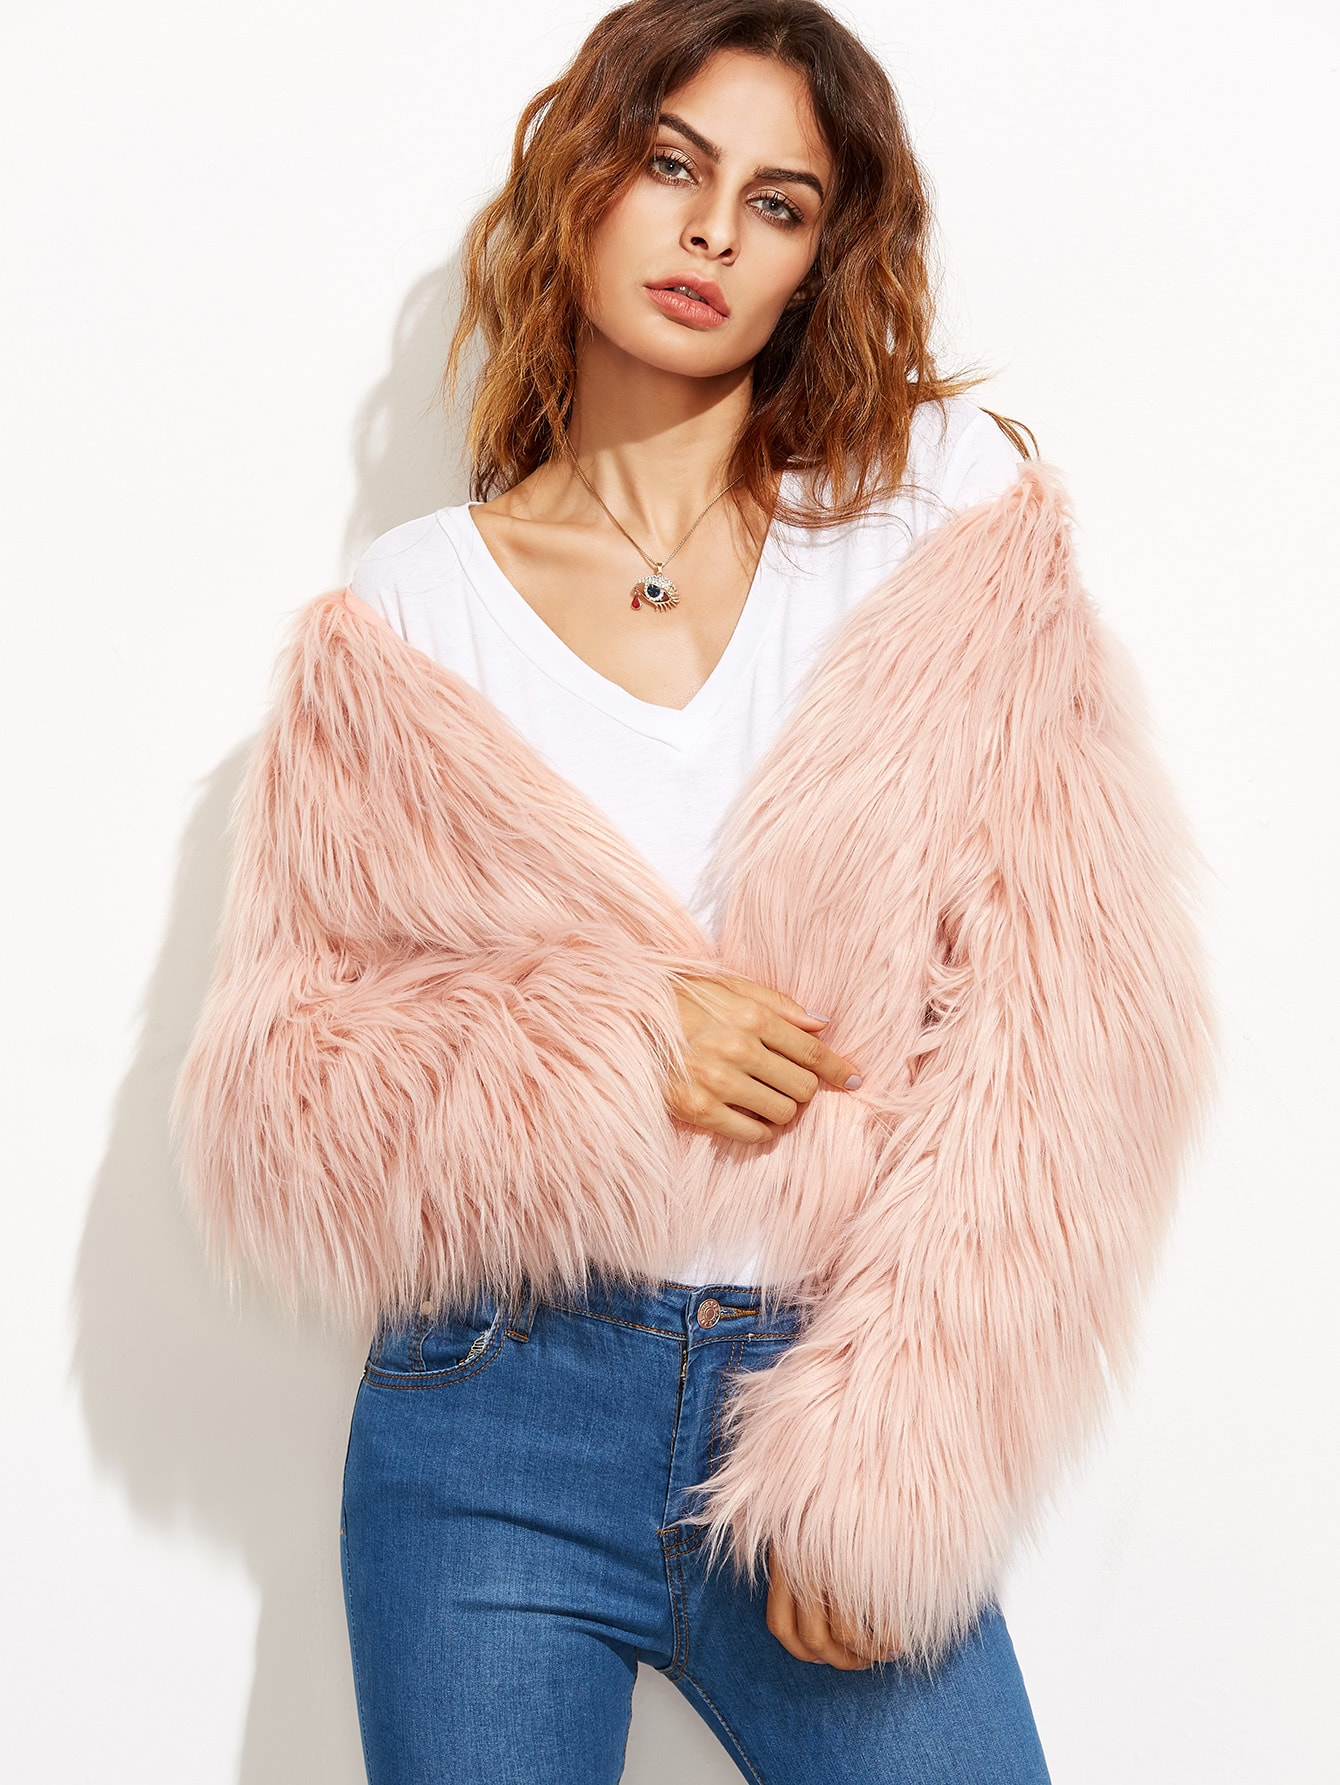 Coats Pink Faux Fur Collarless Cute Elegant Crop Winter Plain Fabric has no stretch Long Sleeve Outerwear.